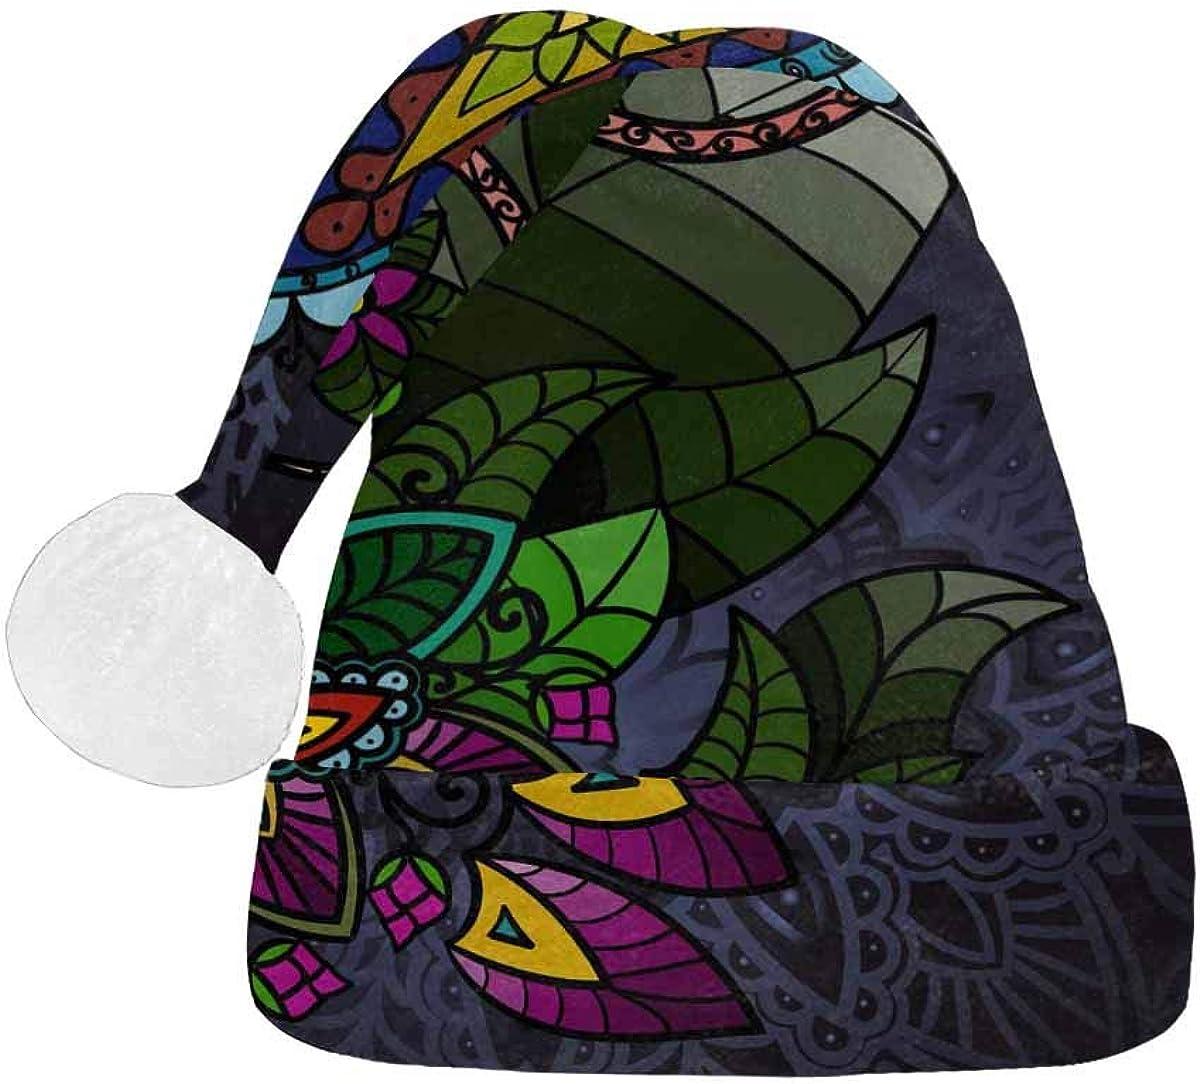 InterestPrint Christmas online shopping Santa Hat Design Fashion Adults Surprise price for